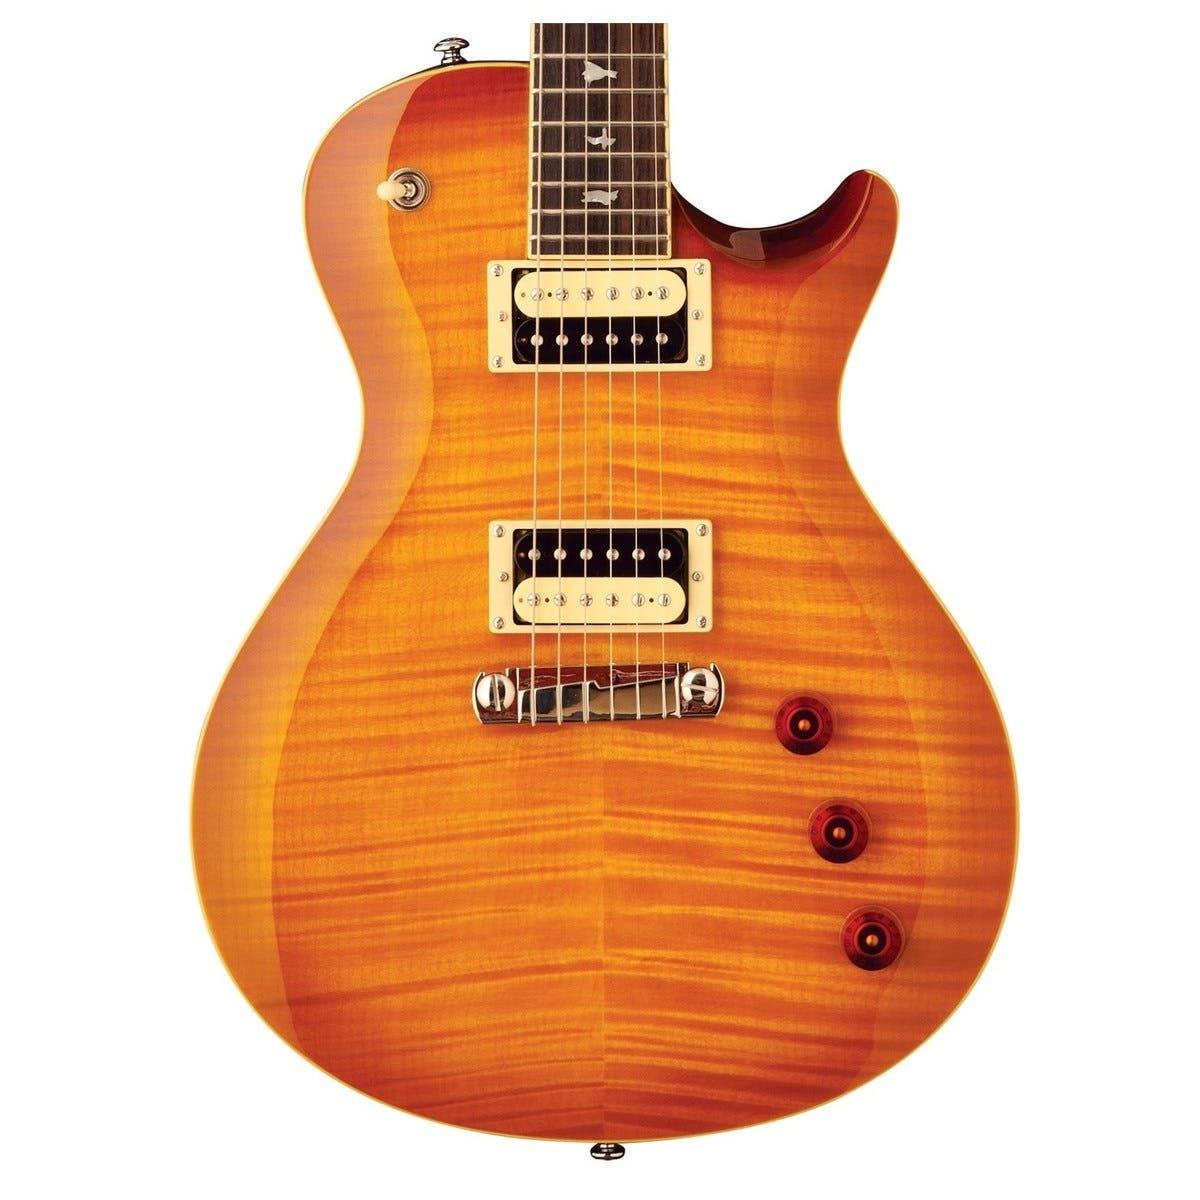 sc 1 st  Andertons & PRS Guitars - Andertons Music Co. islam-shia.org